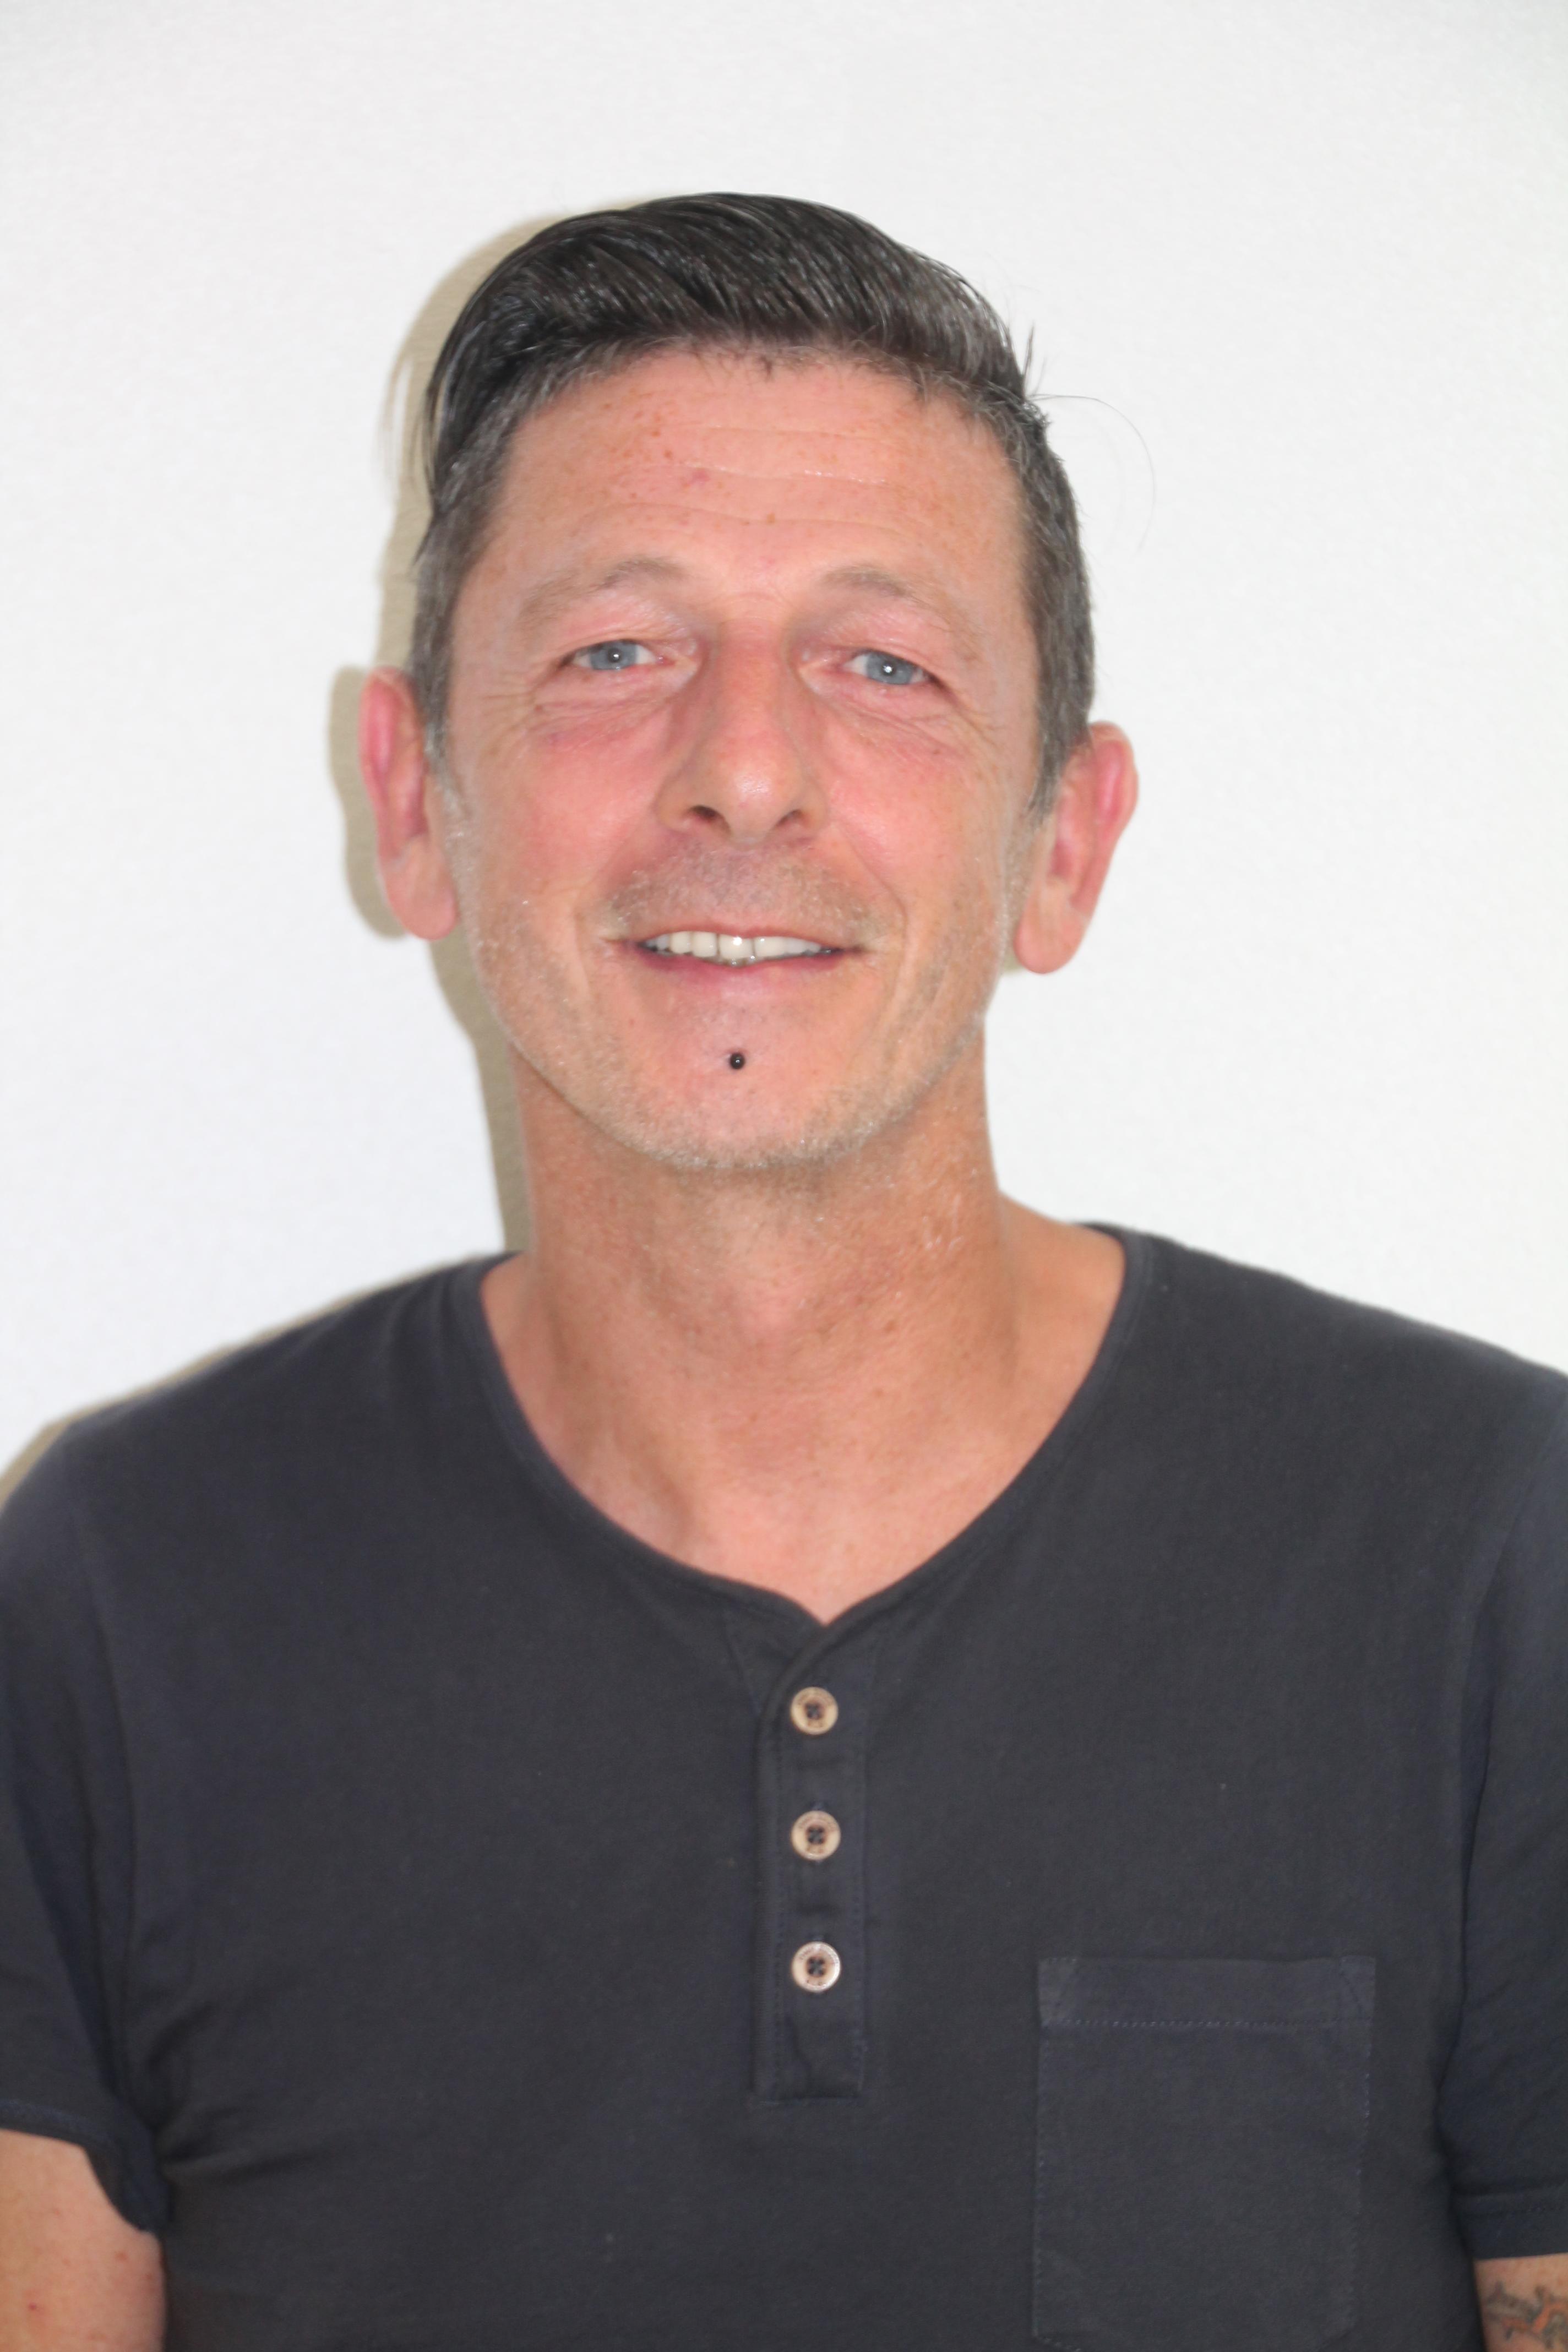 Jean Christian Birbes